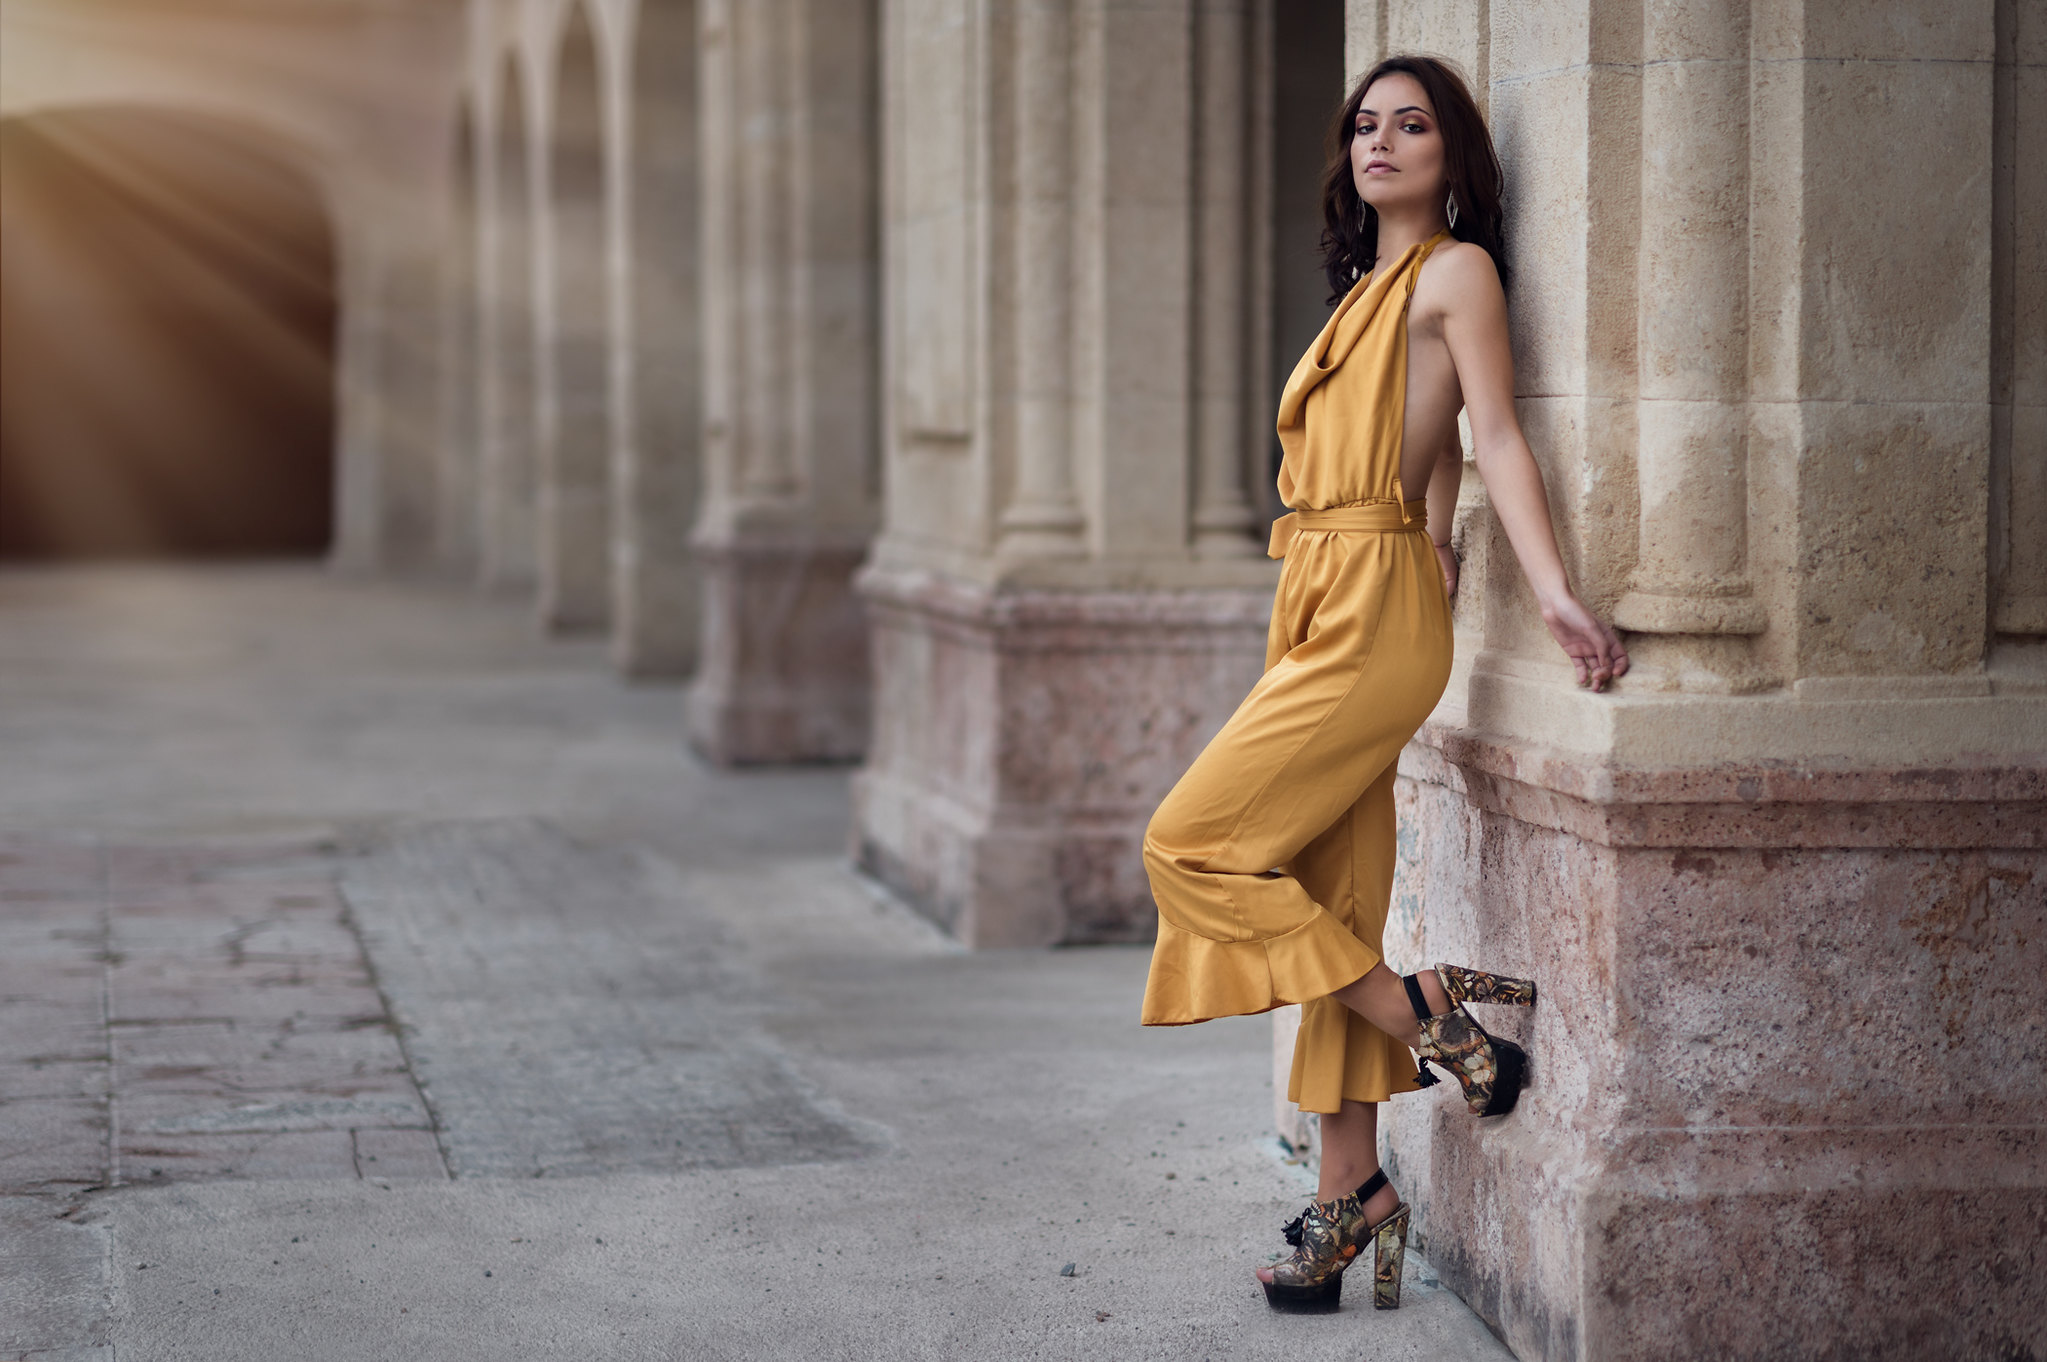 Instagram Gwen Garcia nudes (42 photo), Ass, Paparazzi, Feet, bra 2019